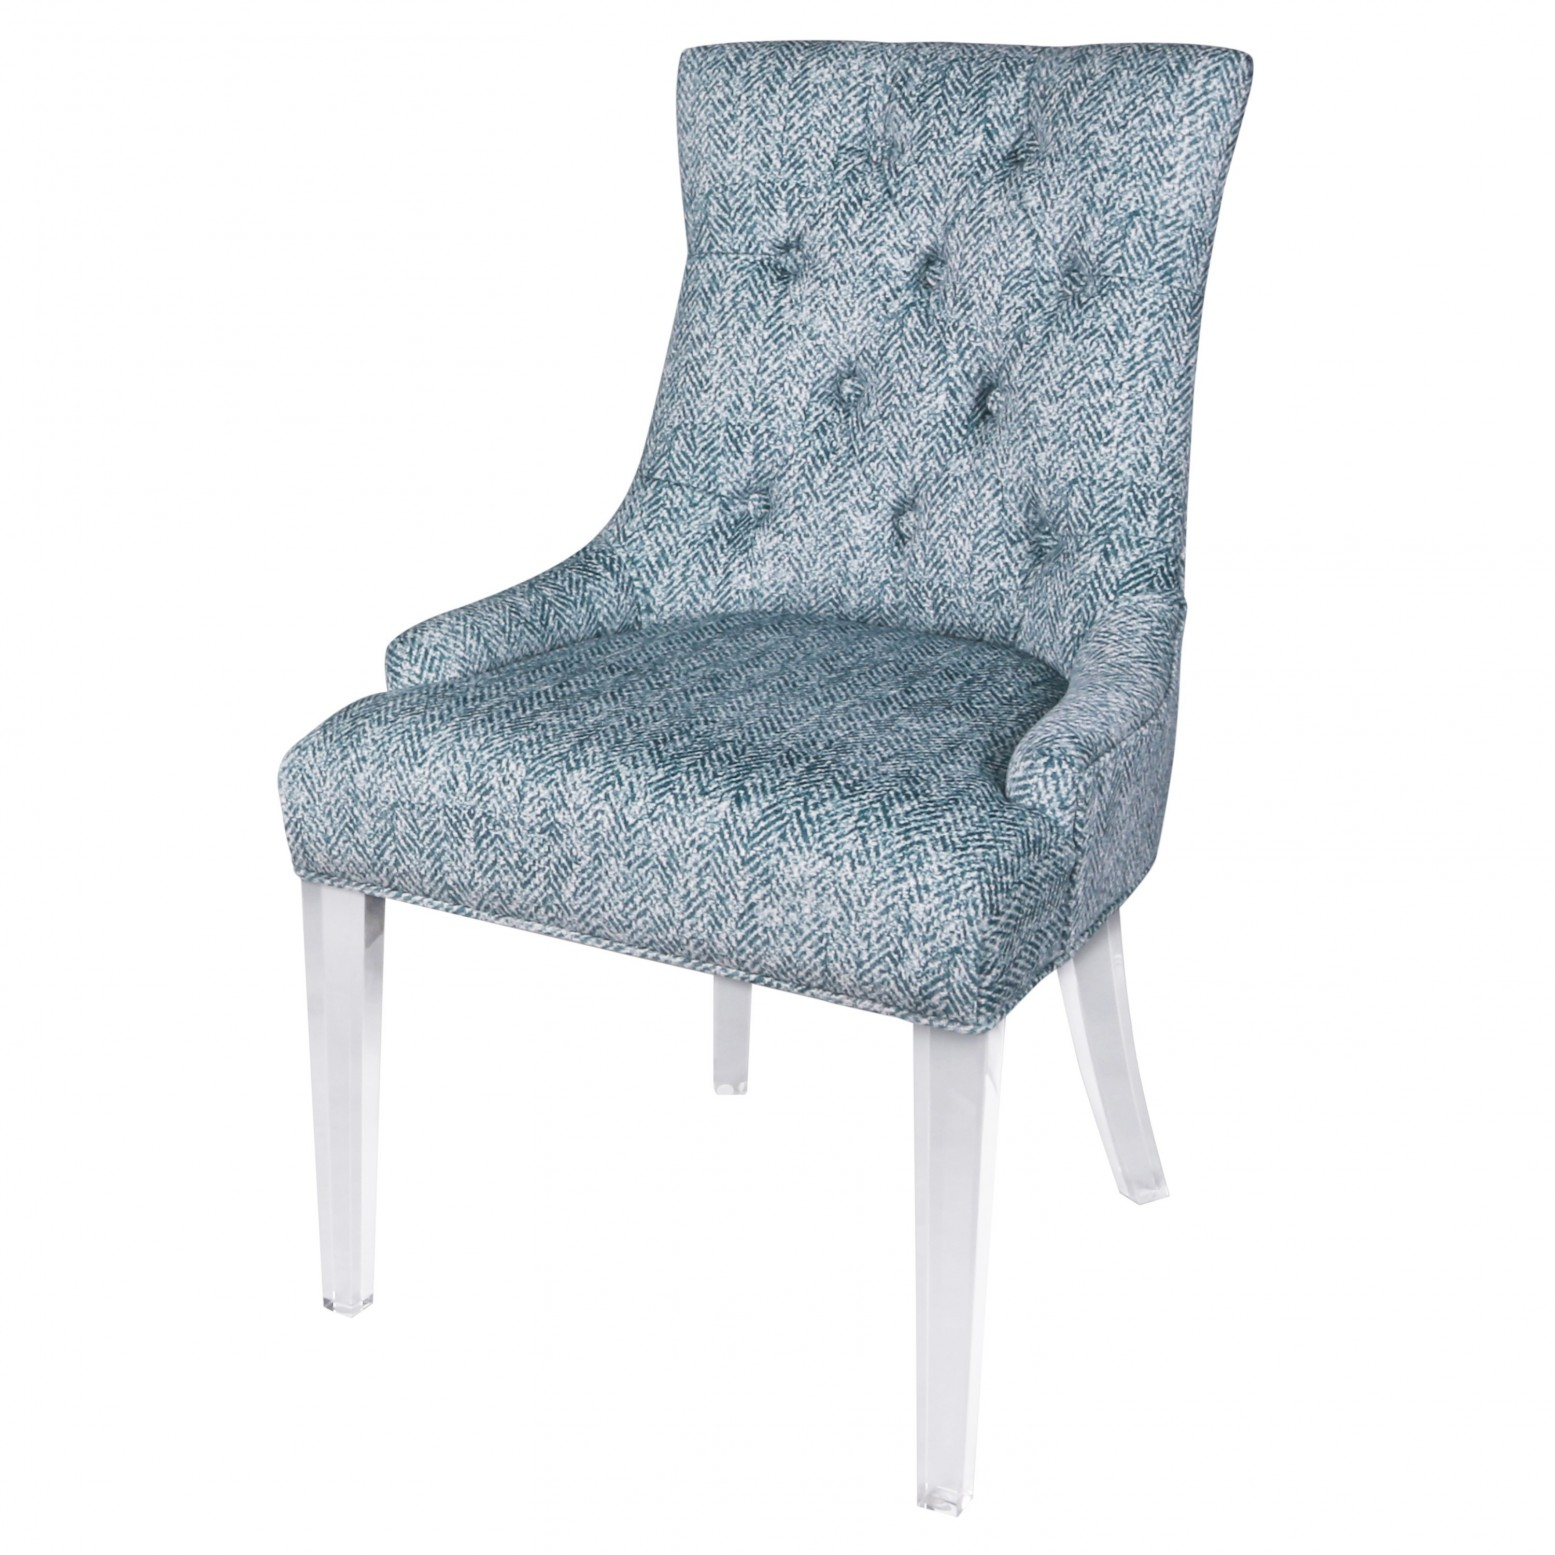 Incredible Audrey Kd Fabric Dining Chair Acrylic Legs Quiver Indigo Blue Inzonedesignstudio Interior Chair Design Inzonedesignstudiocom